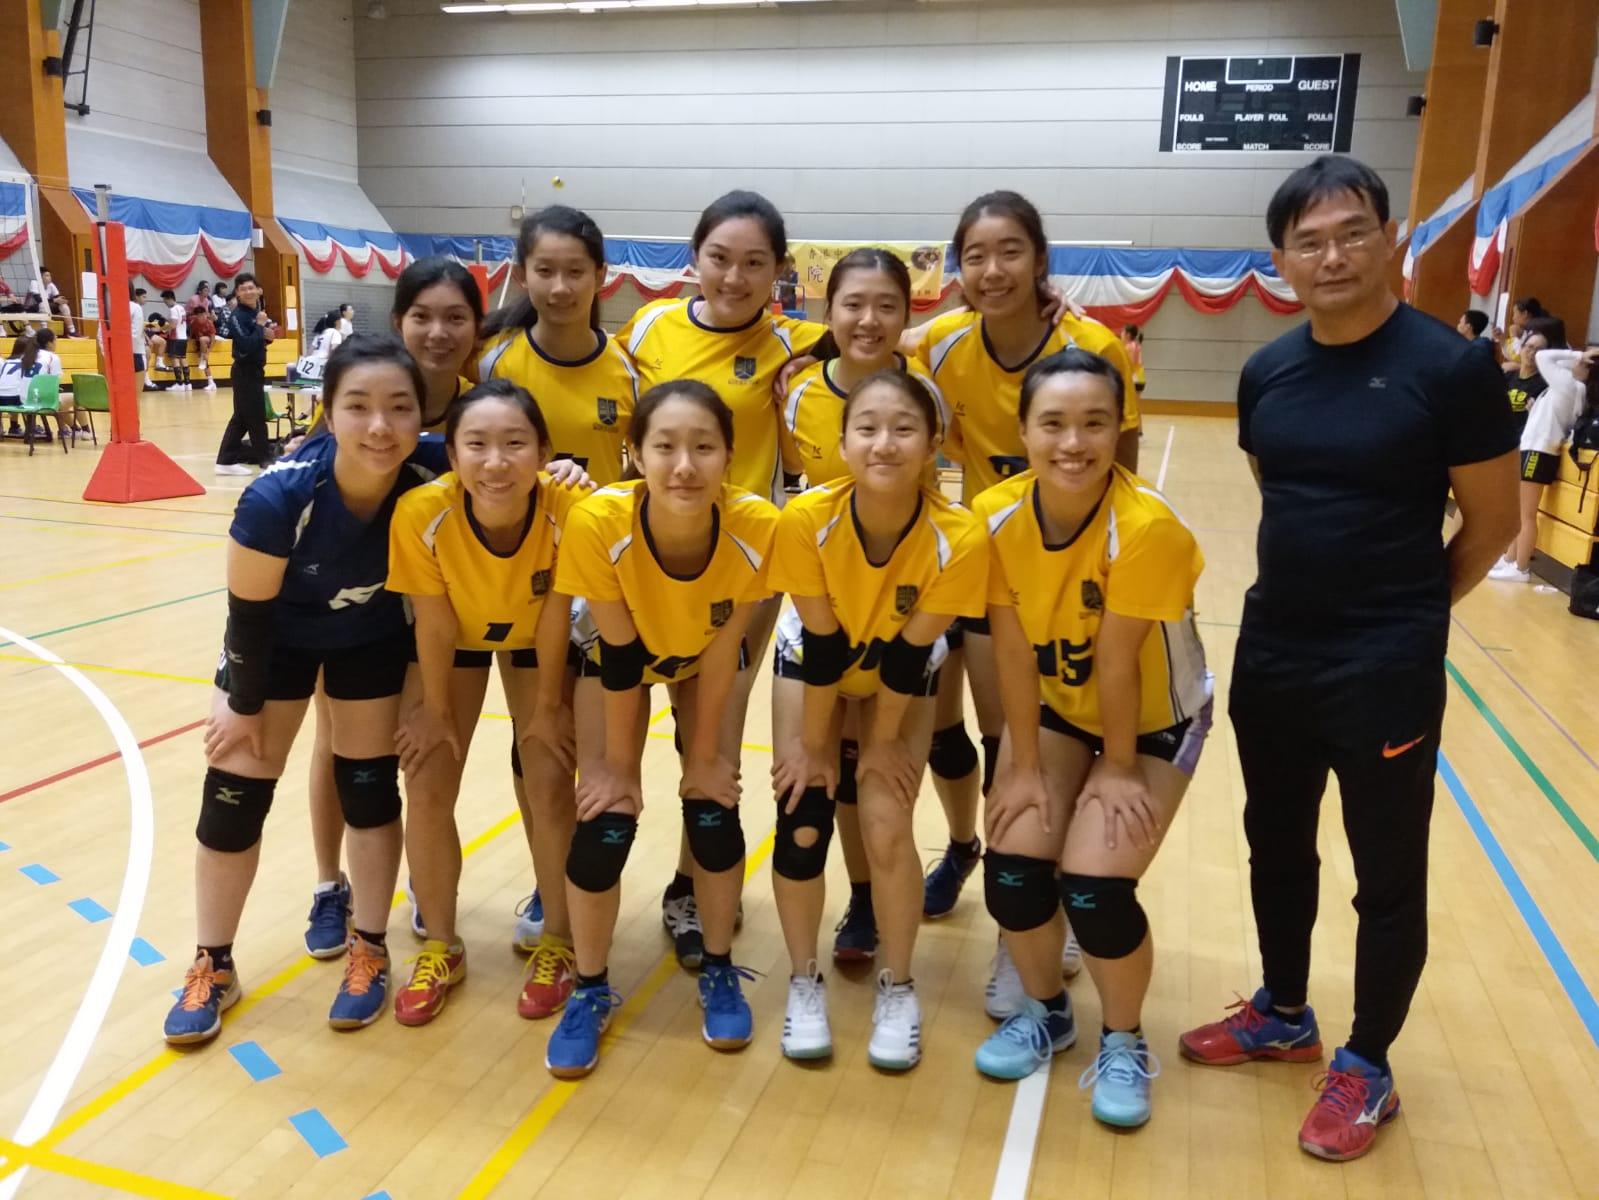 女子排球隊 Women Volleyball Team